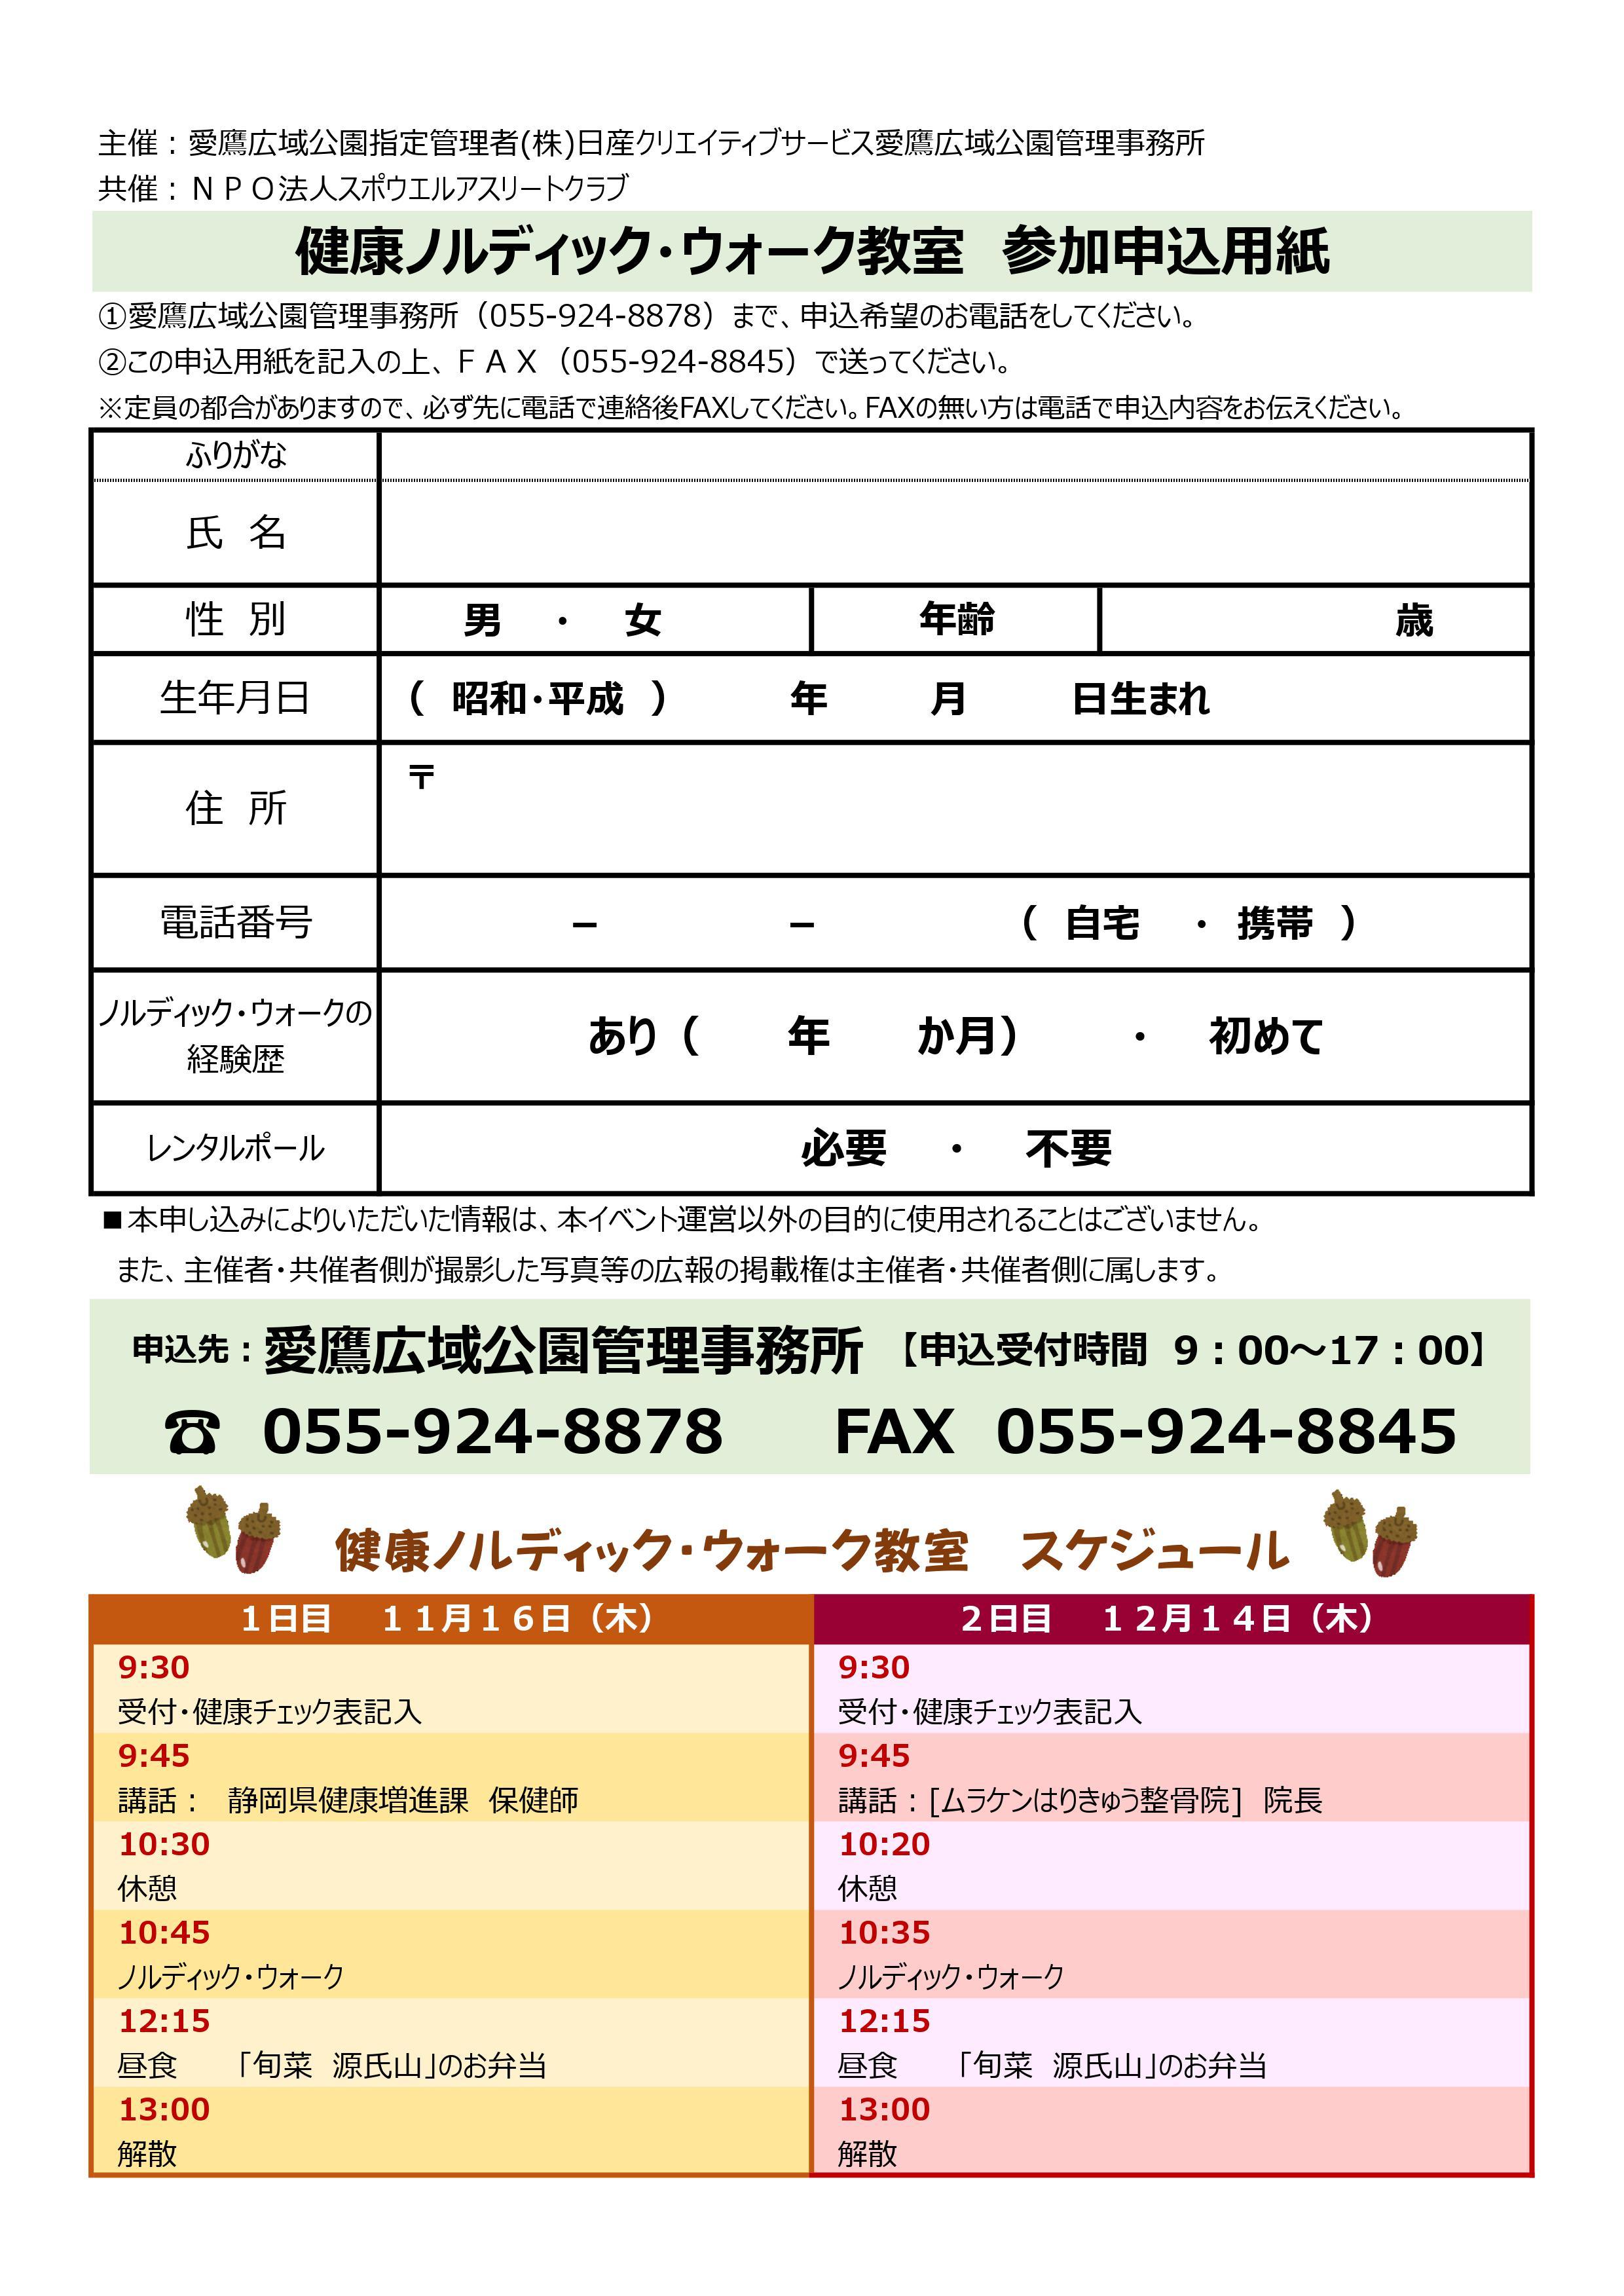 kenko201711161214form.jpg